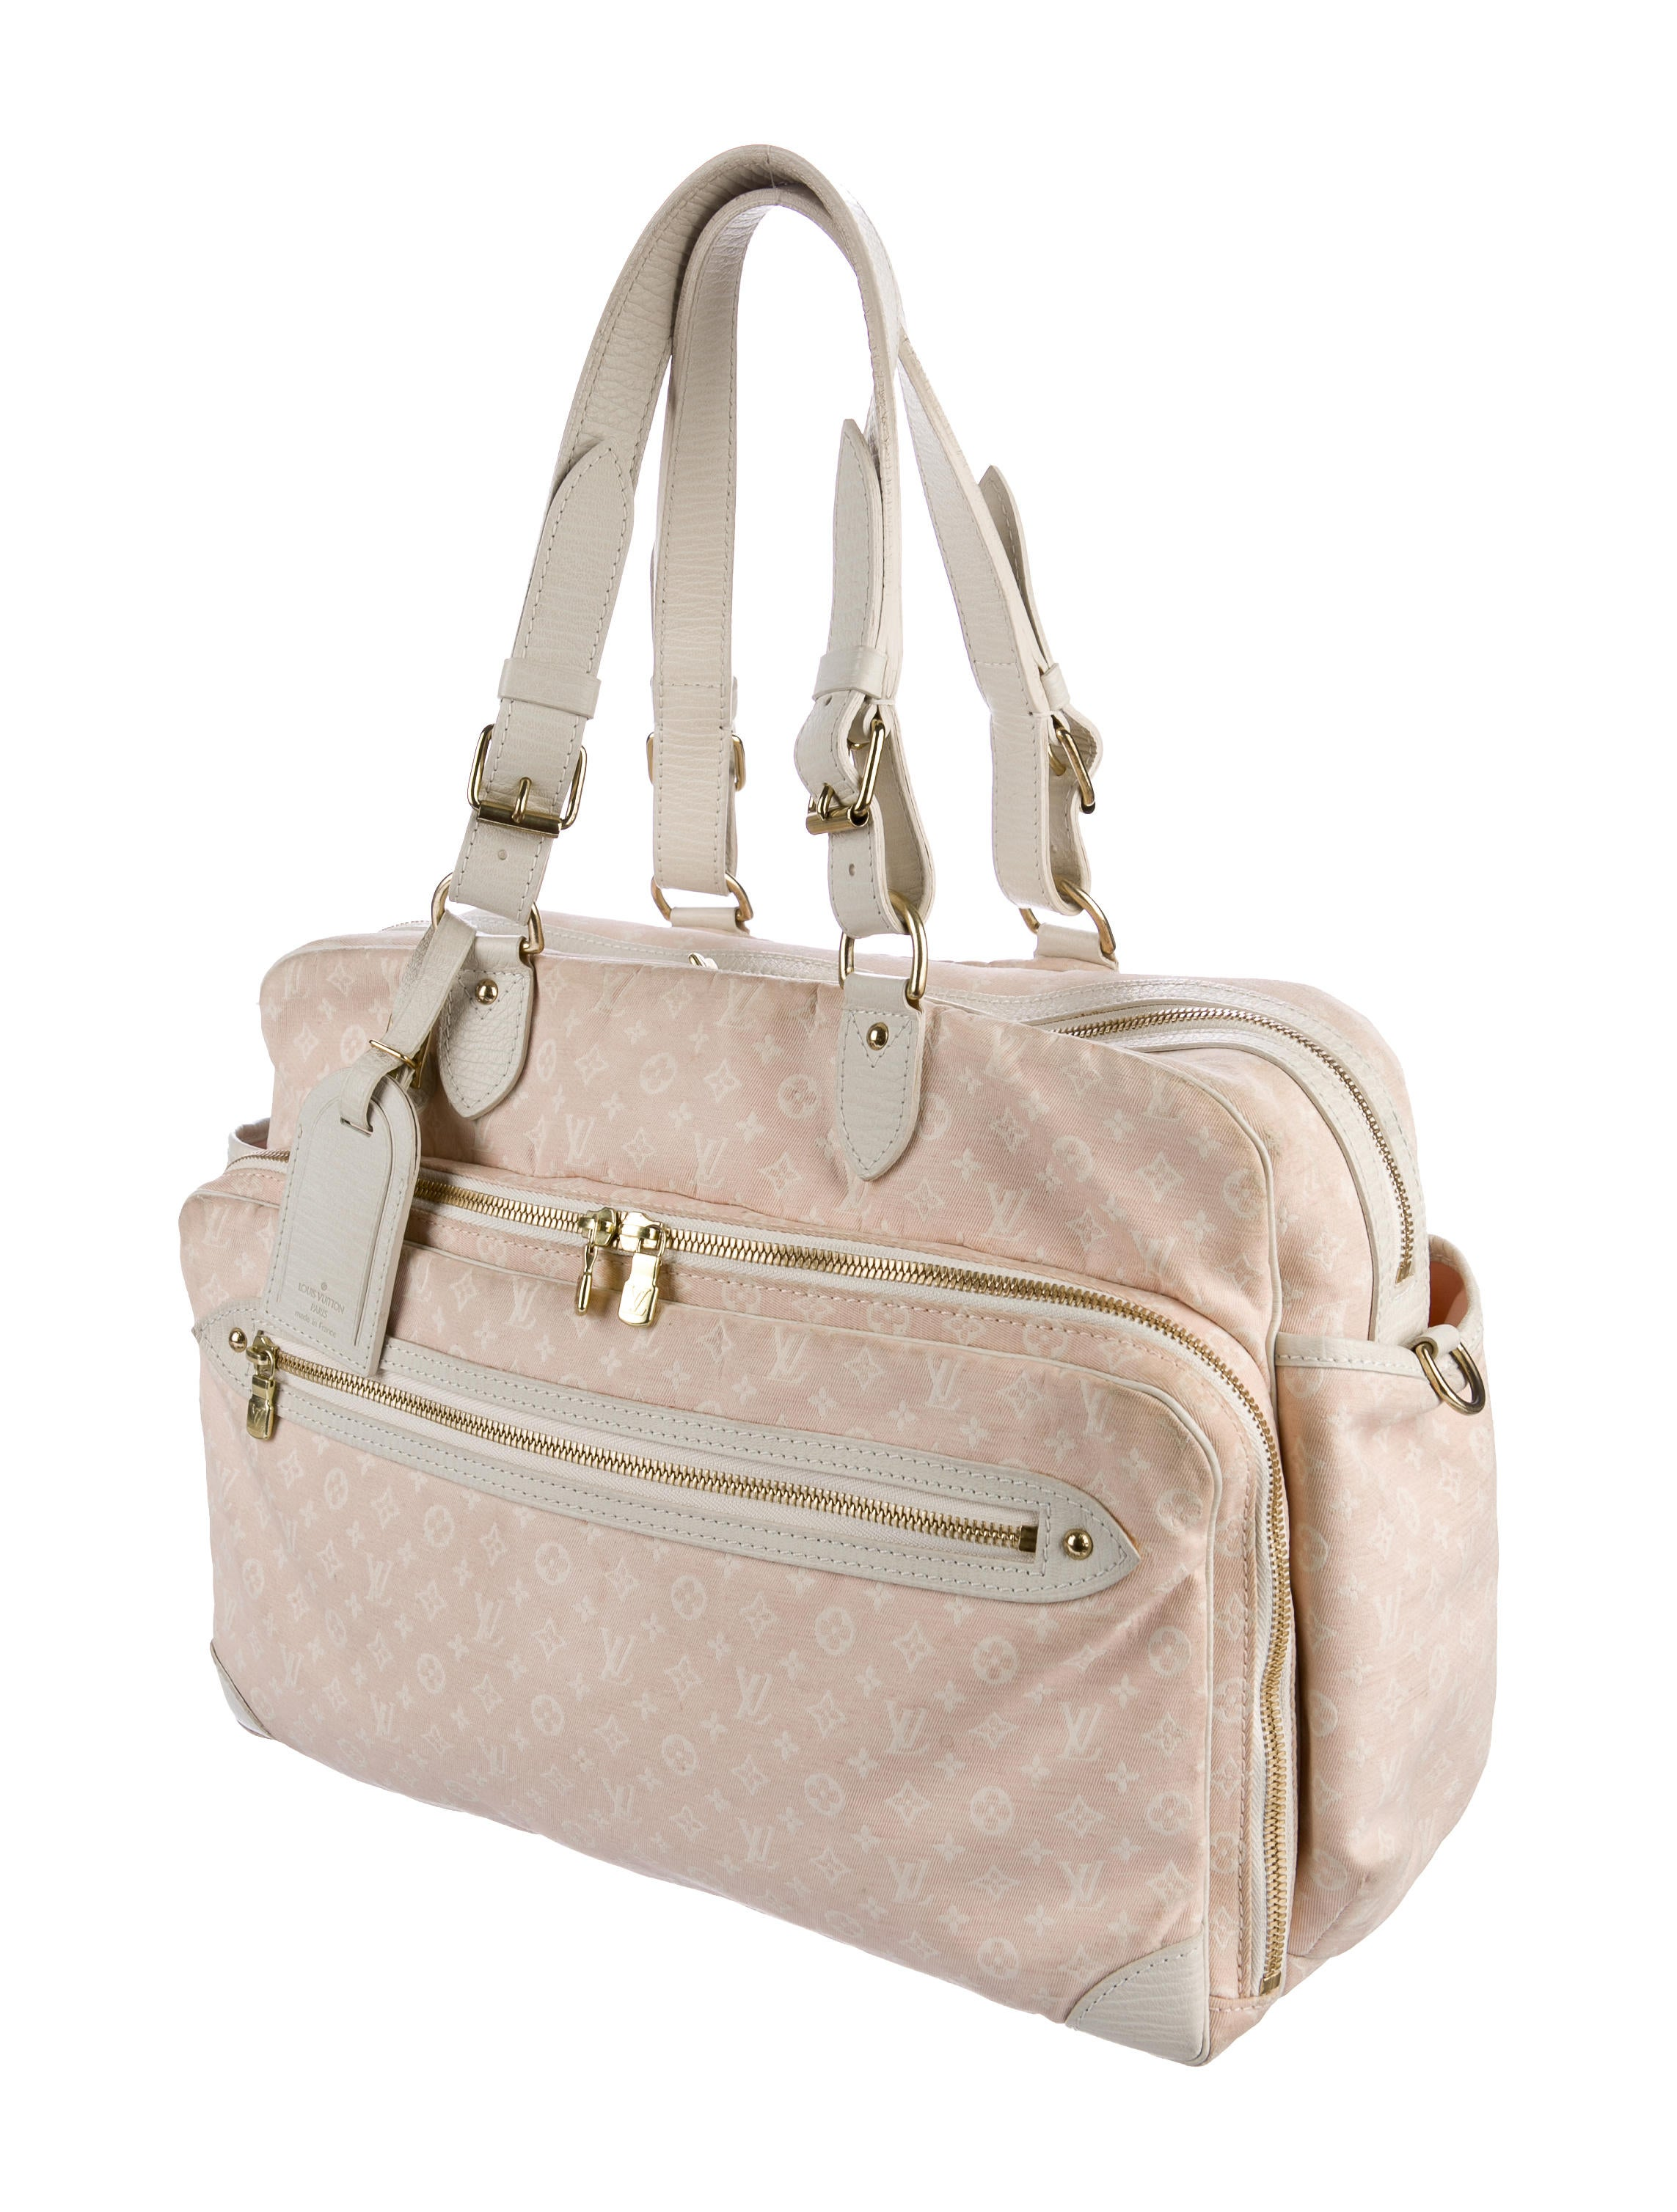 louis vuitton mini lin sac a langer diaper bag handbags lou132602 the realreal. Black Bedroom Furniture Sets. Home Design Ideas